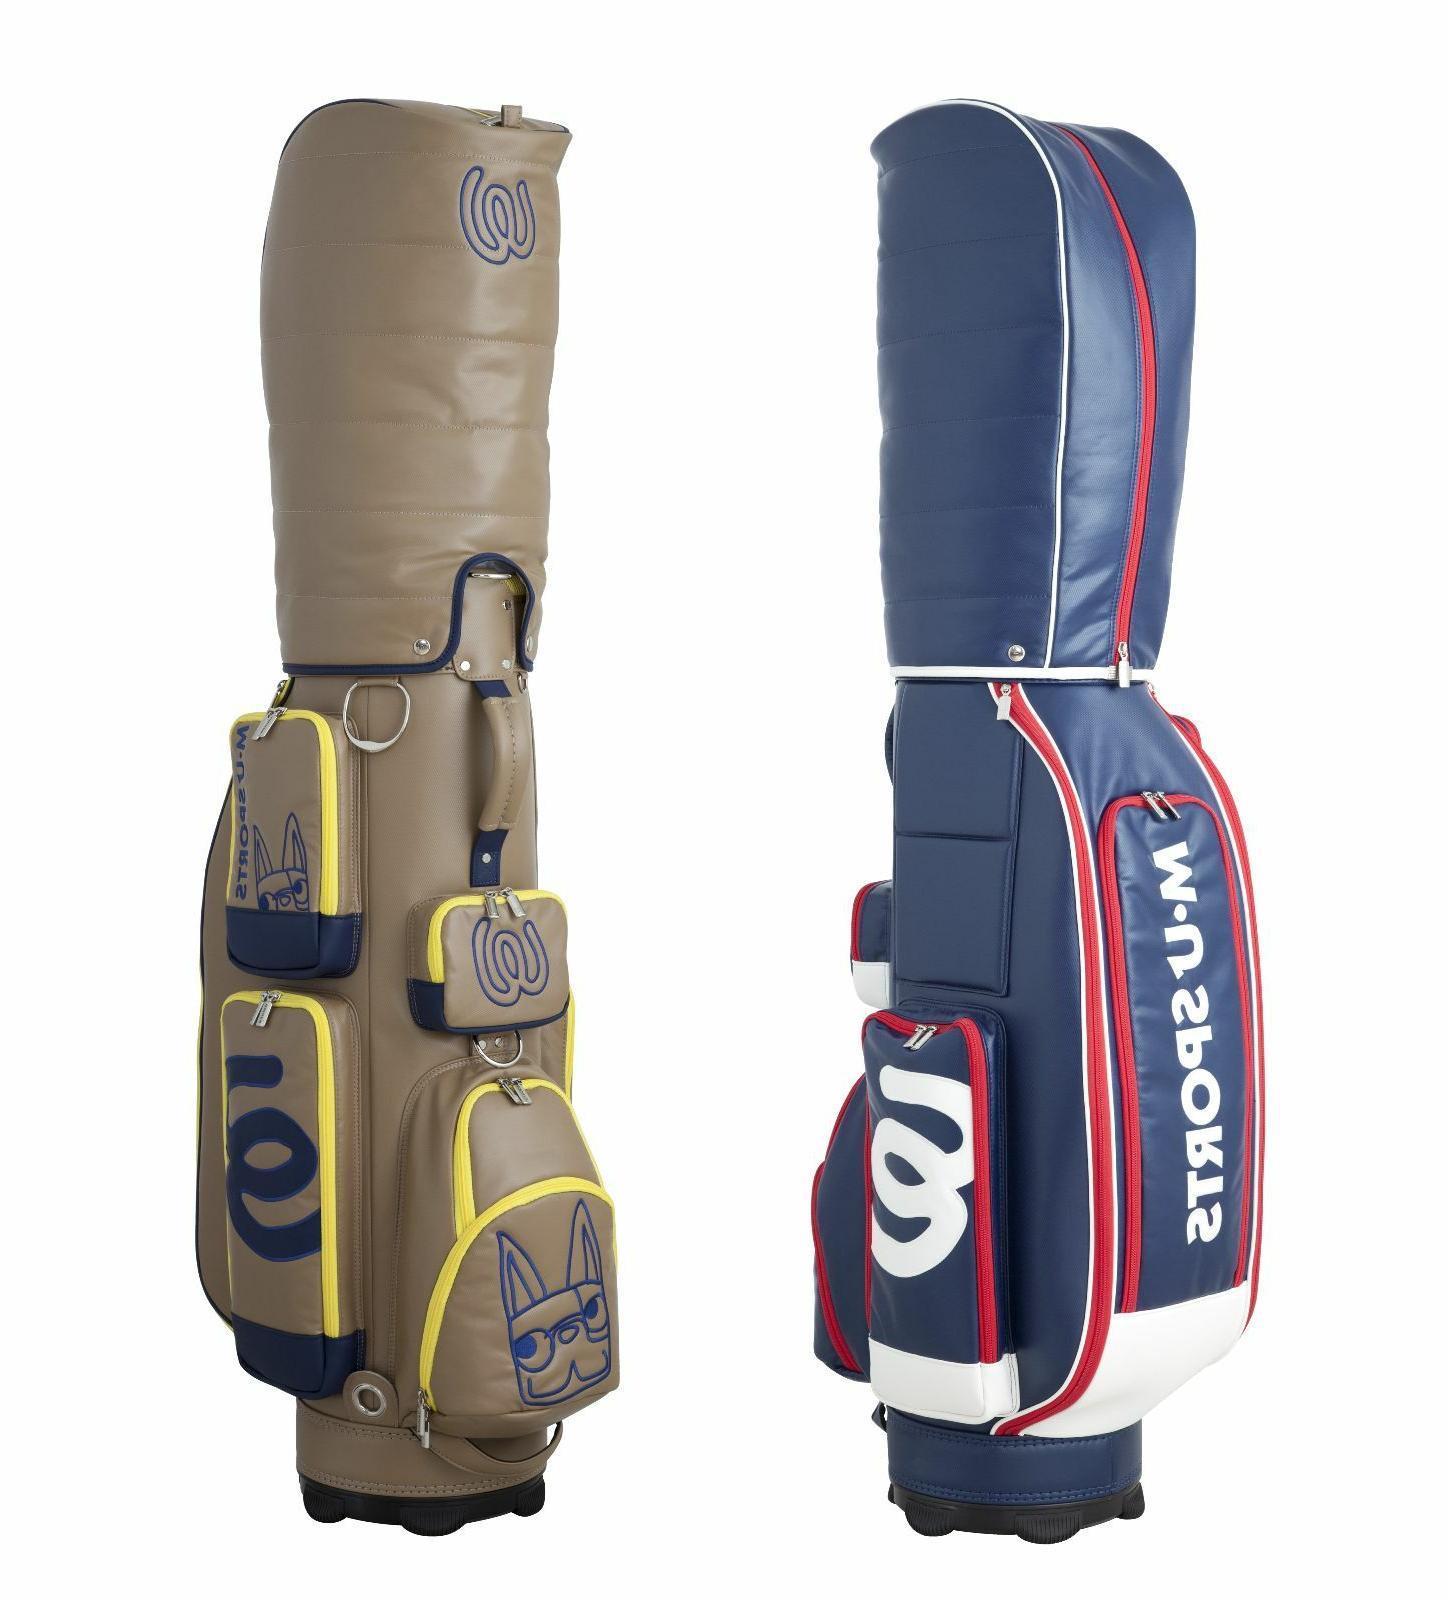 New MU Sports Japanese Brand Golf Cart Bag - 703R6151 Beige